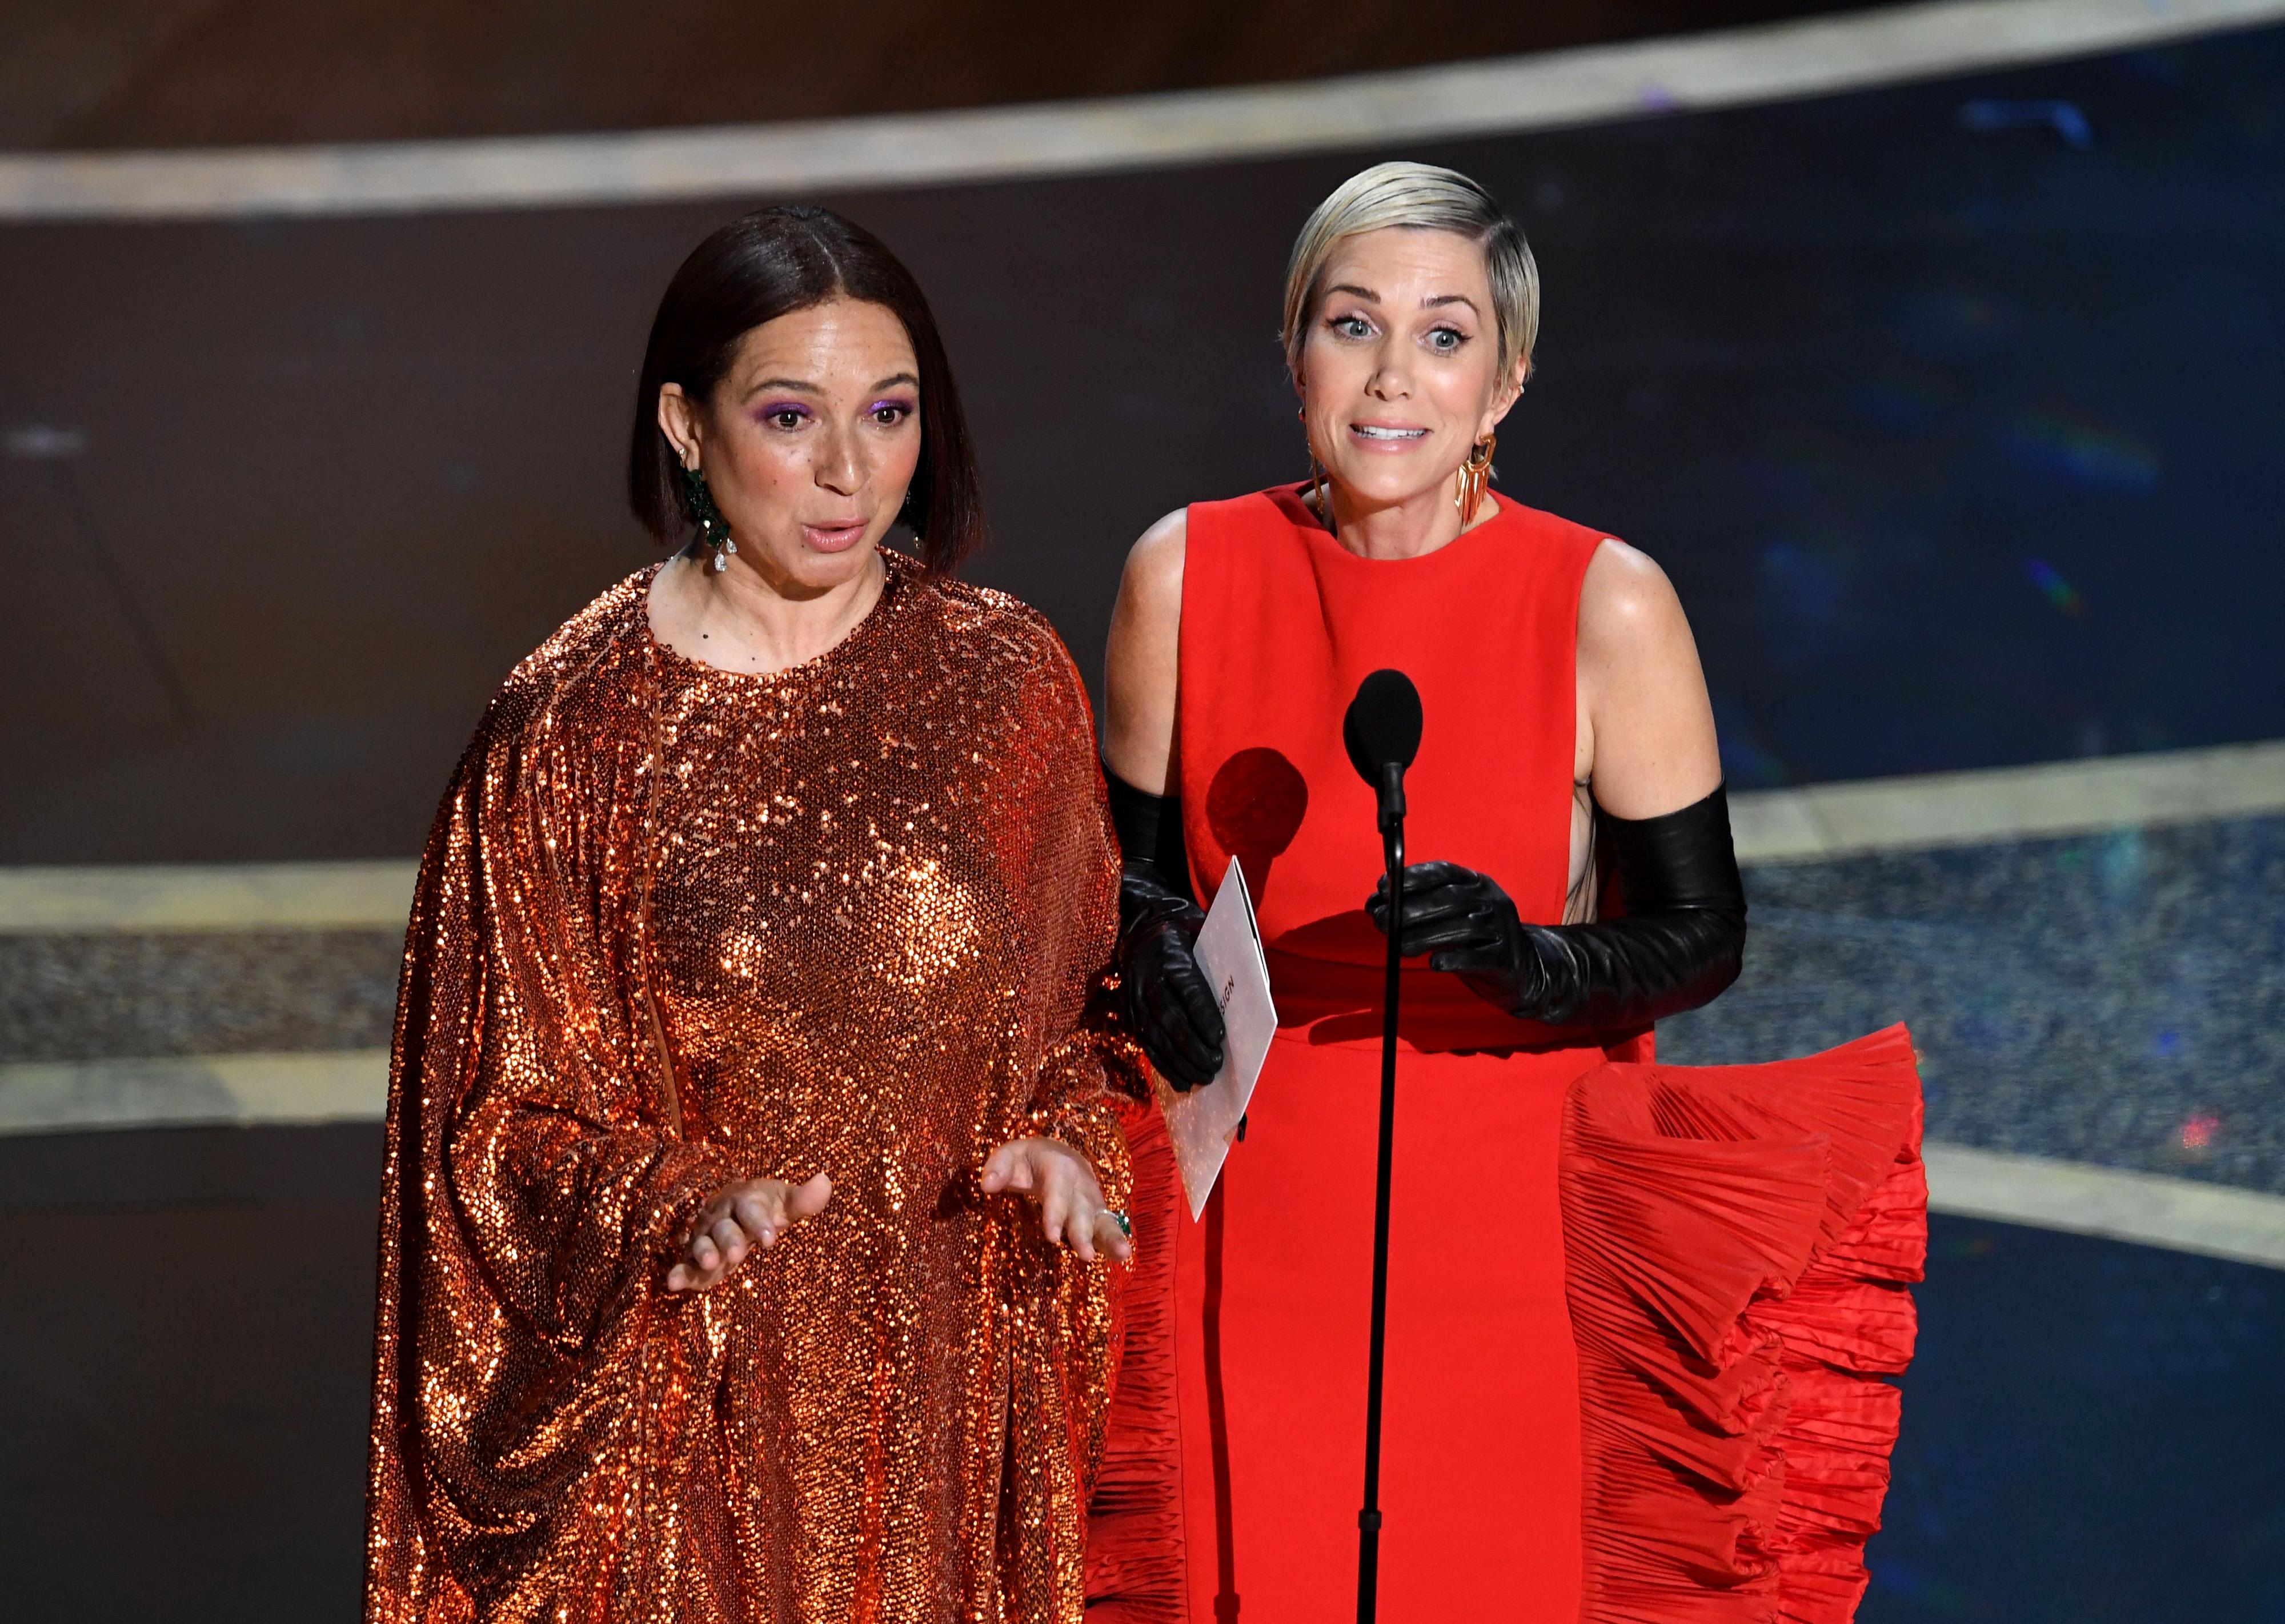 Maya Rudolph and Kristen Wiig at the 2020 Oscars.